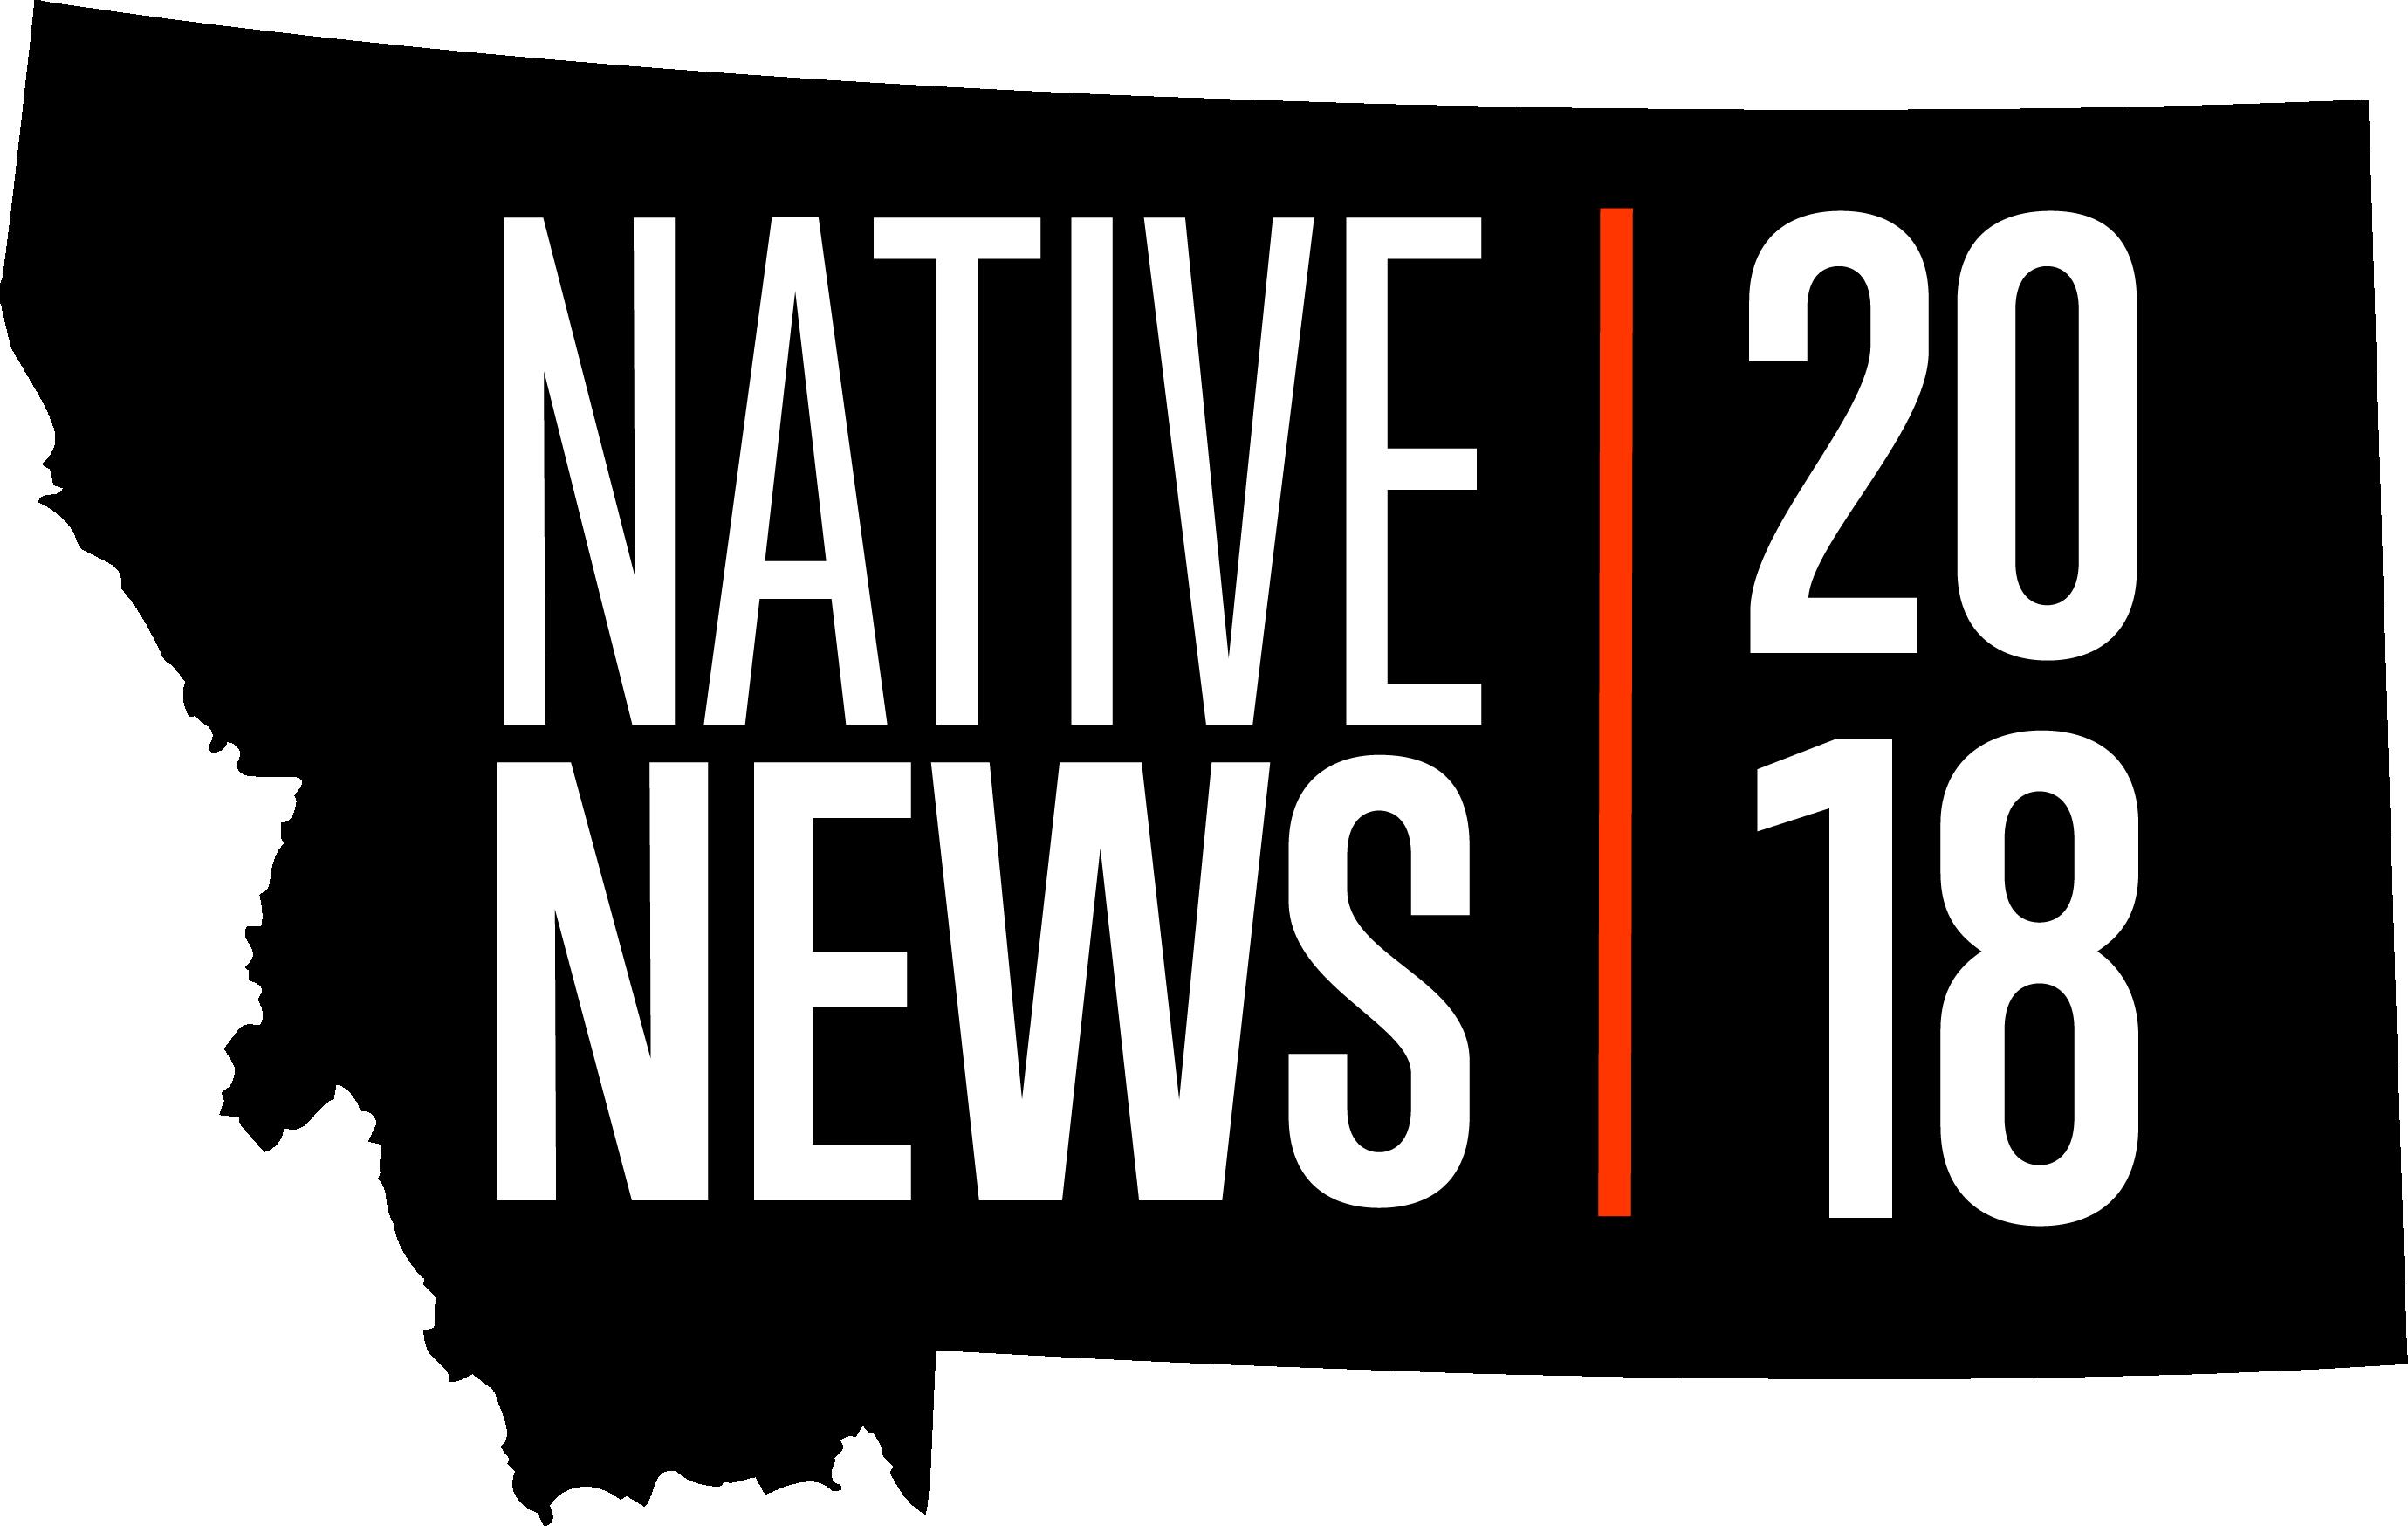 Native News 2018